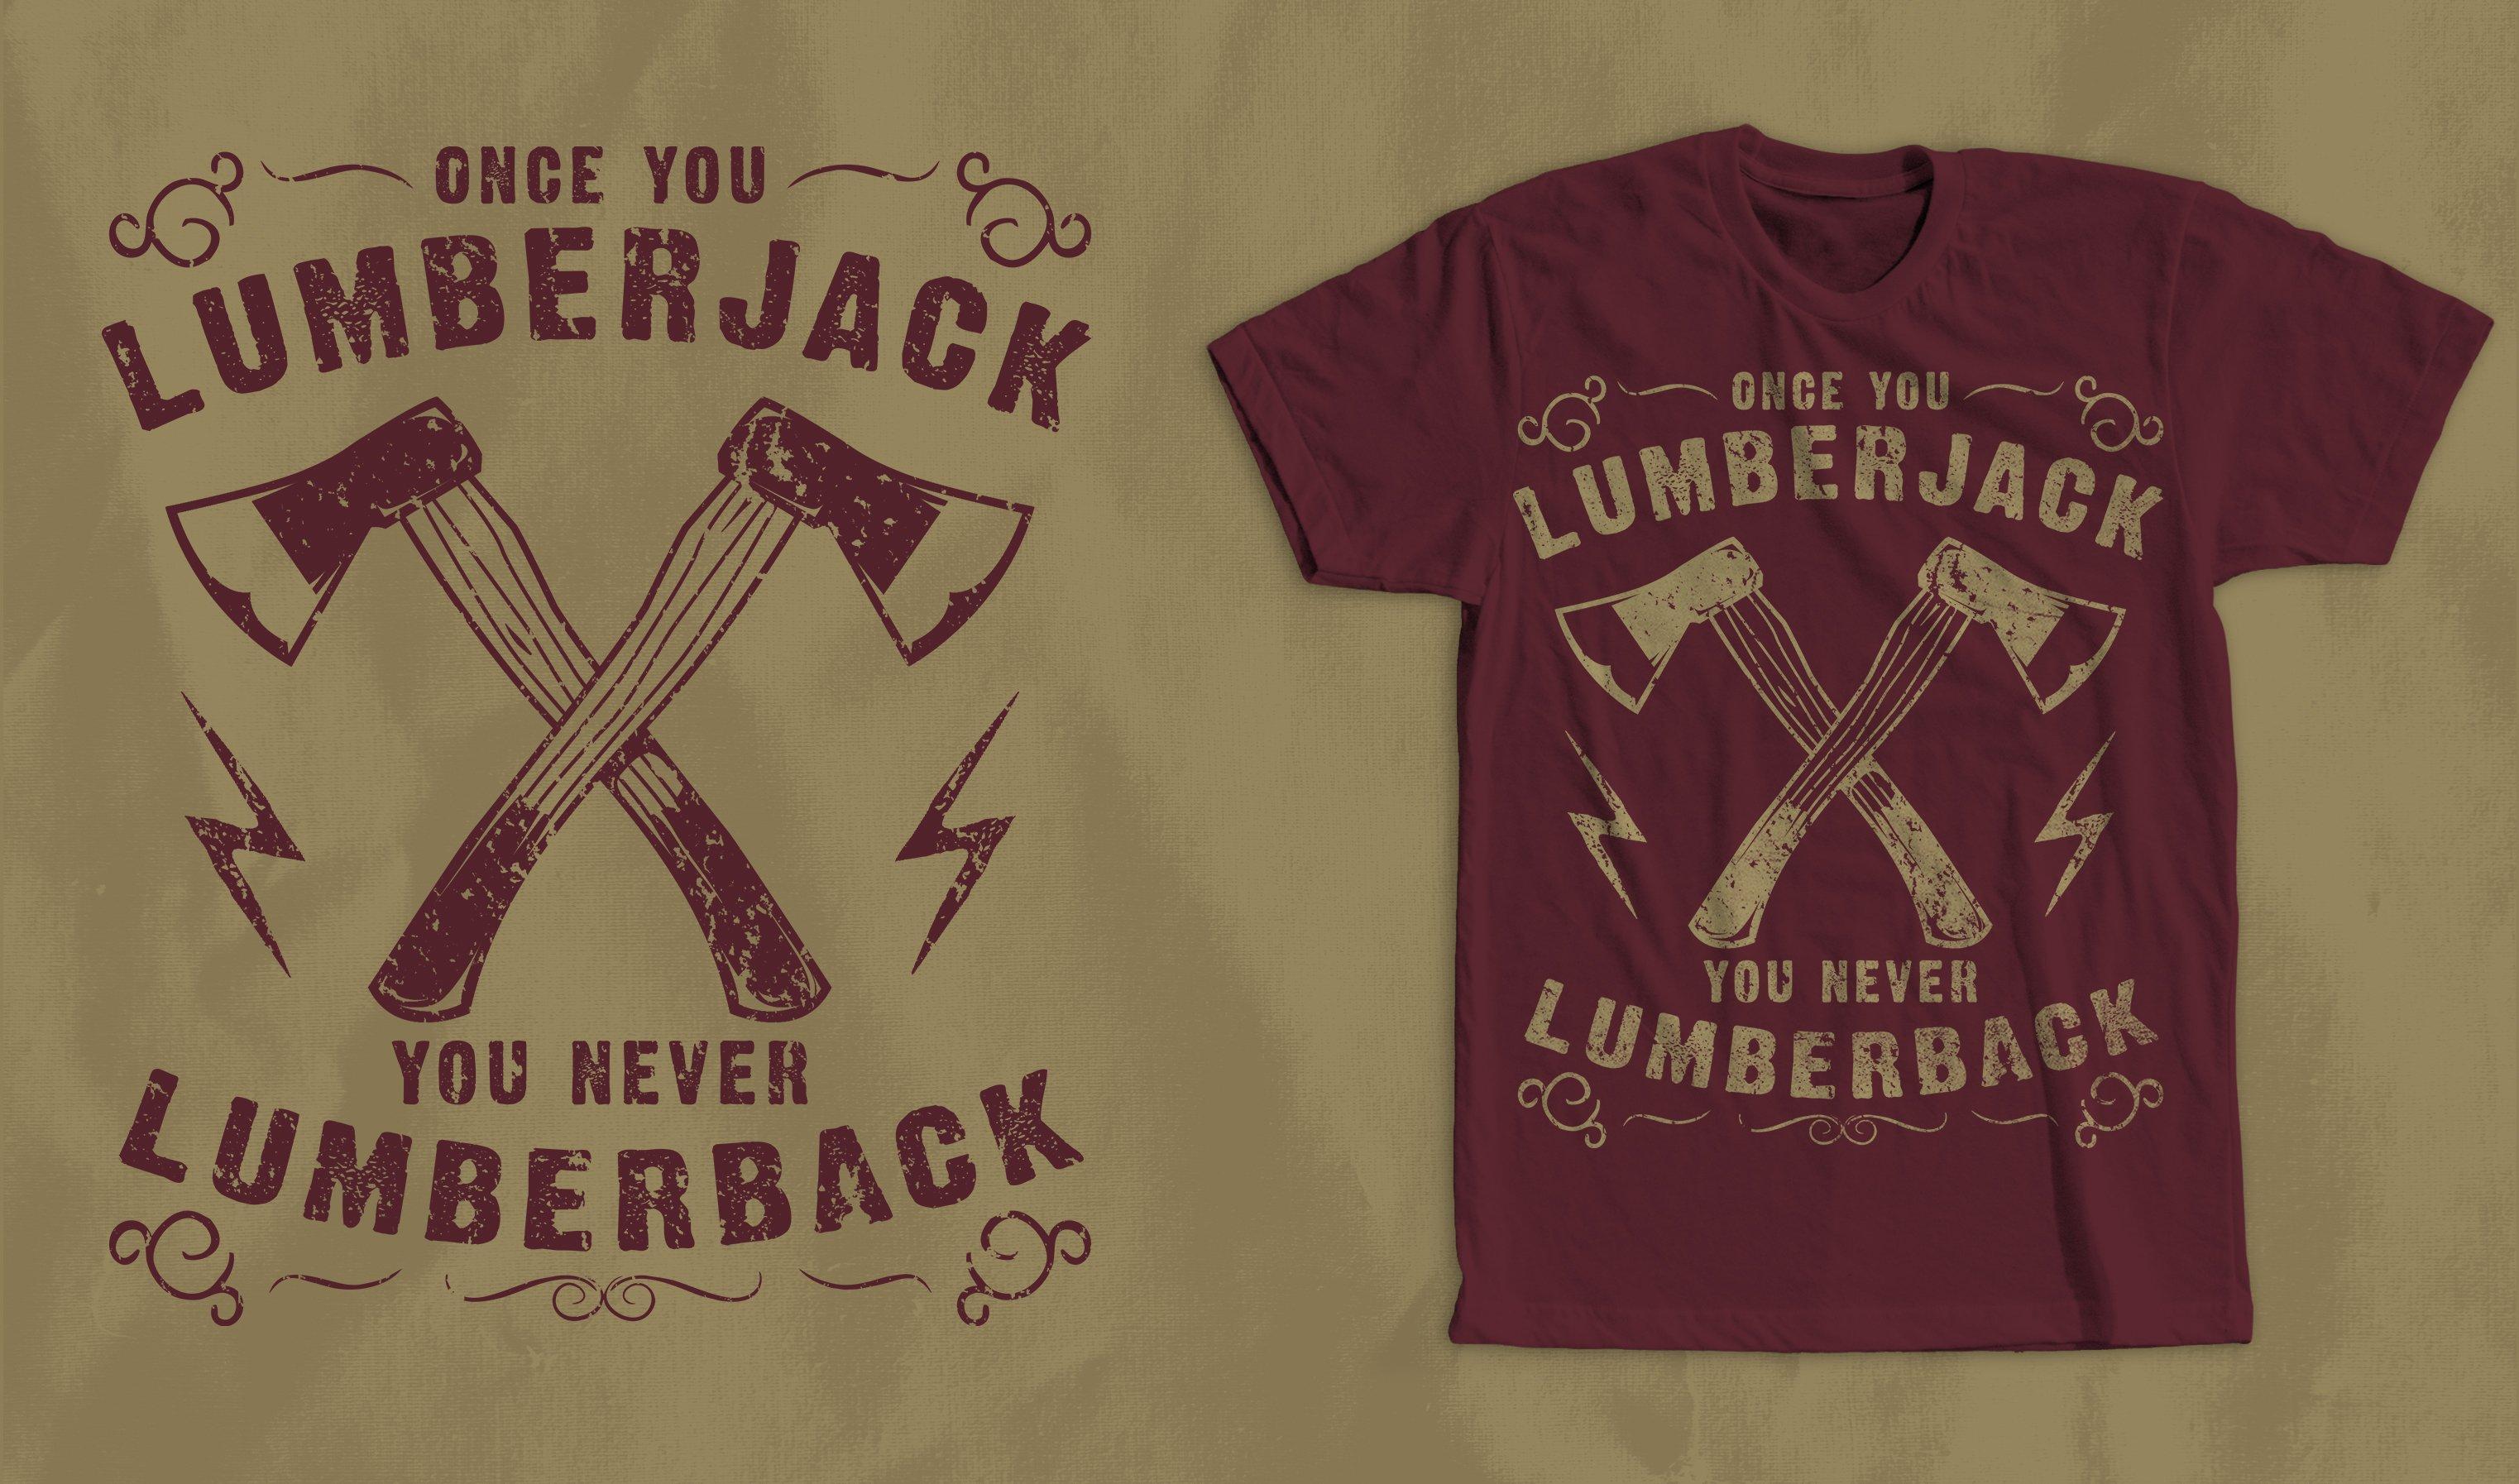 Lumberjack Vintage T Shirt Design Illustrations Creative Market